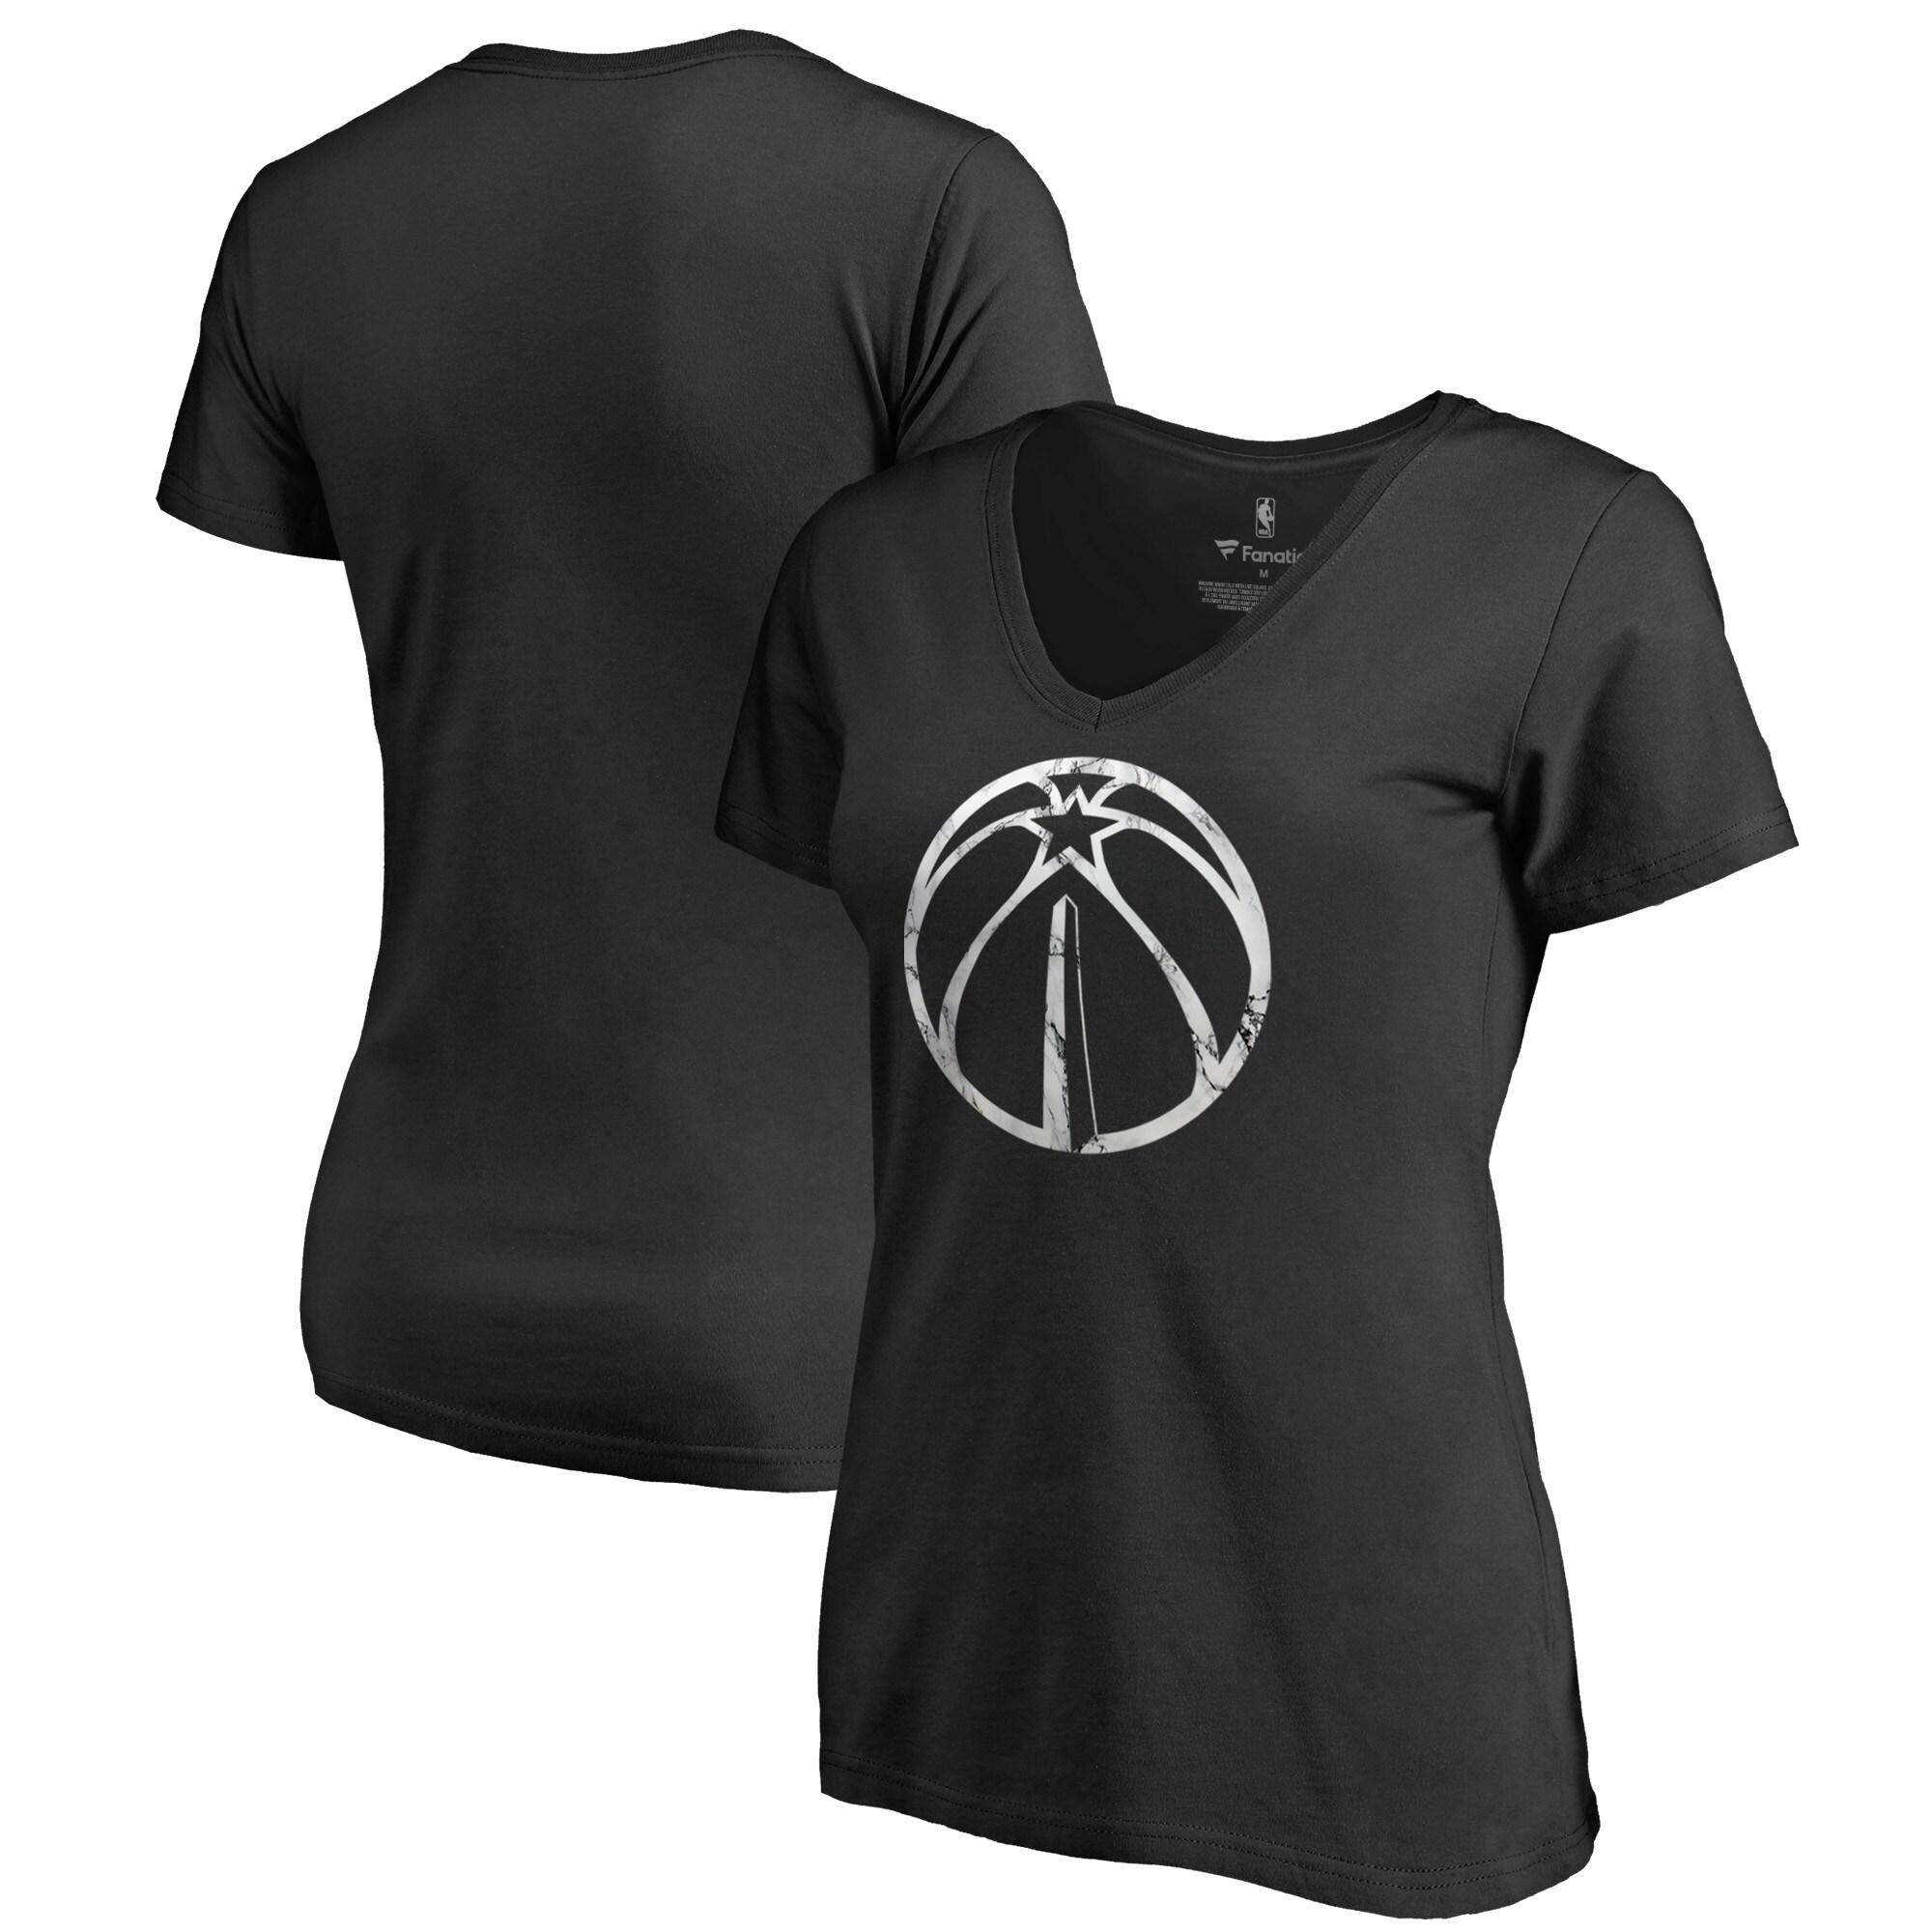 Washington Wizards Fanatics Branded Women's Marble Logo Plus Size V-Neck T-Shirt - Black